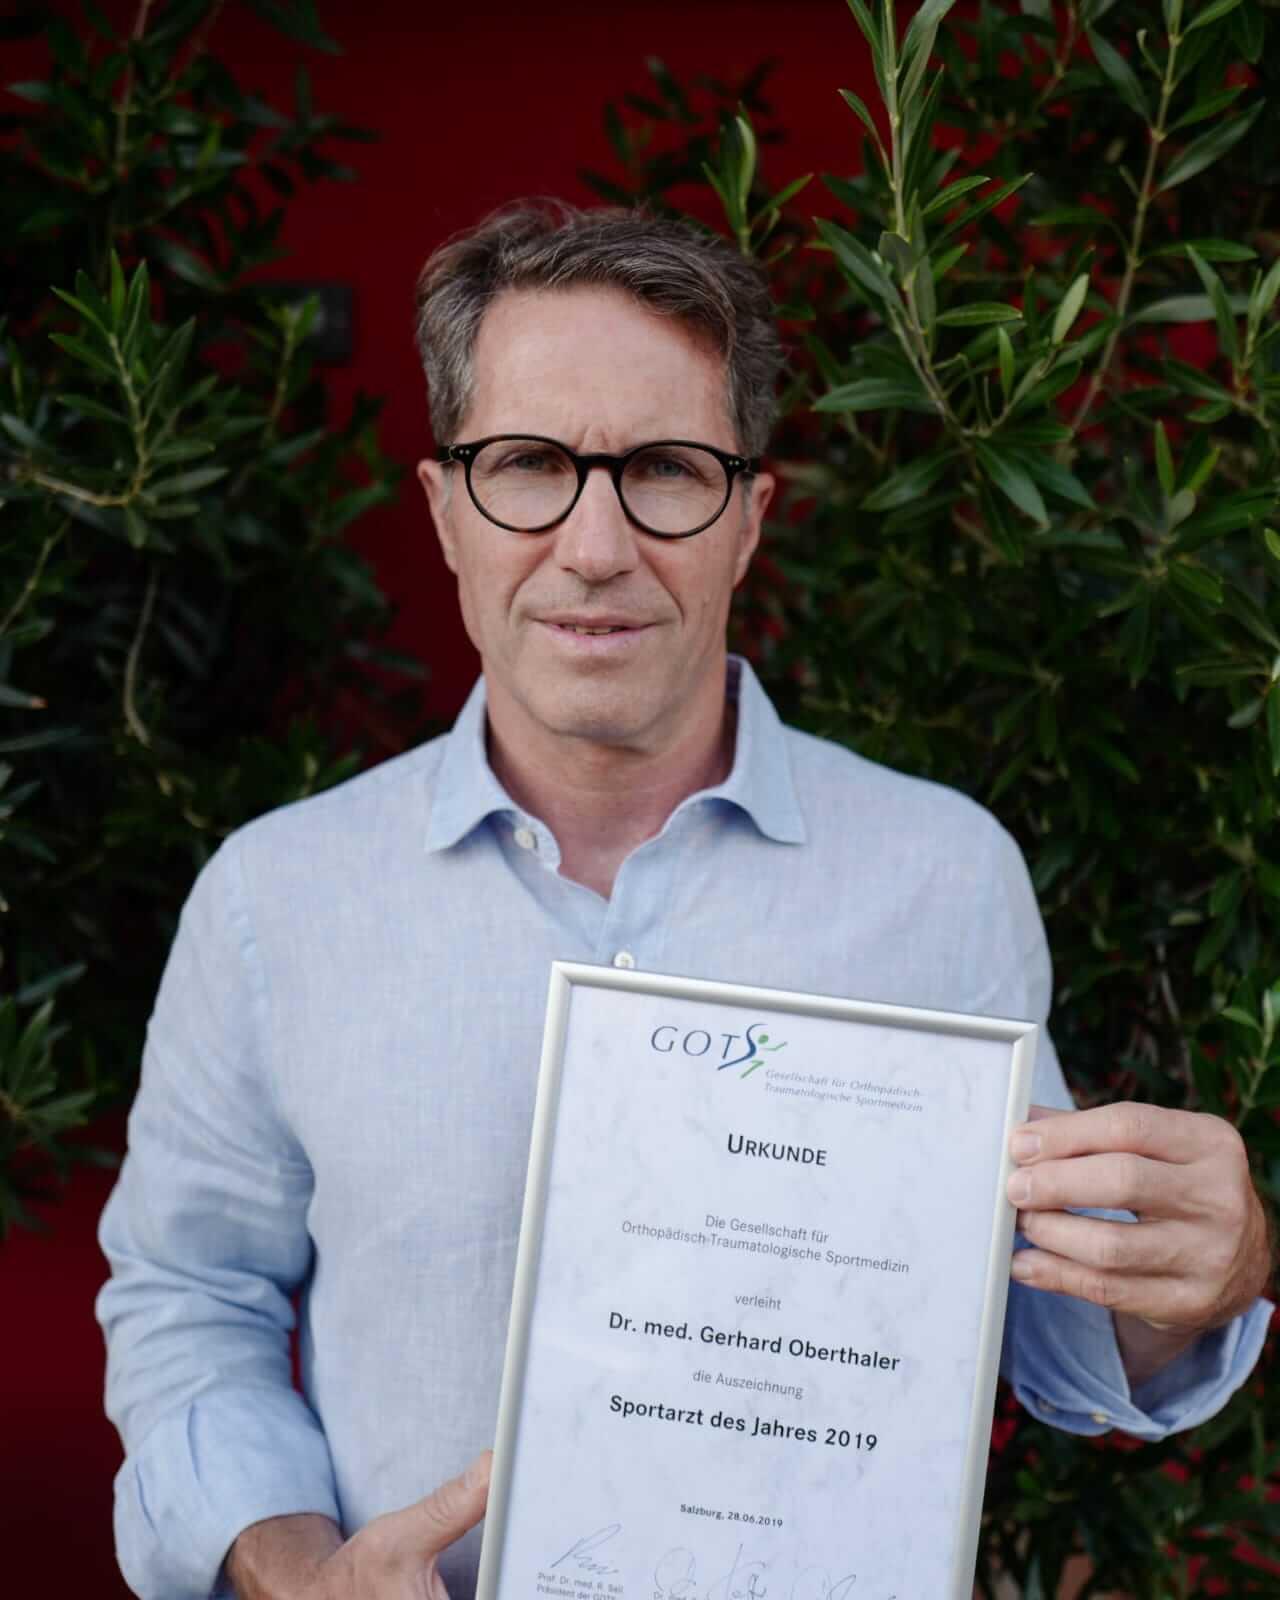 Sportarzt des Jahres – Dr. Gerhard Oberthaler